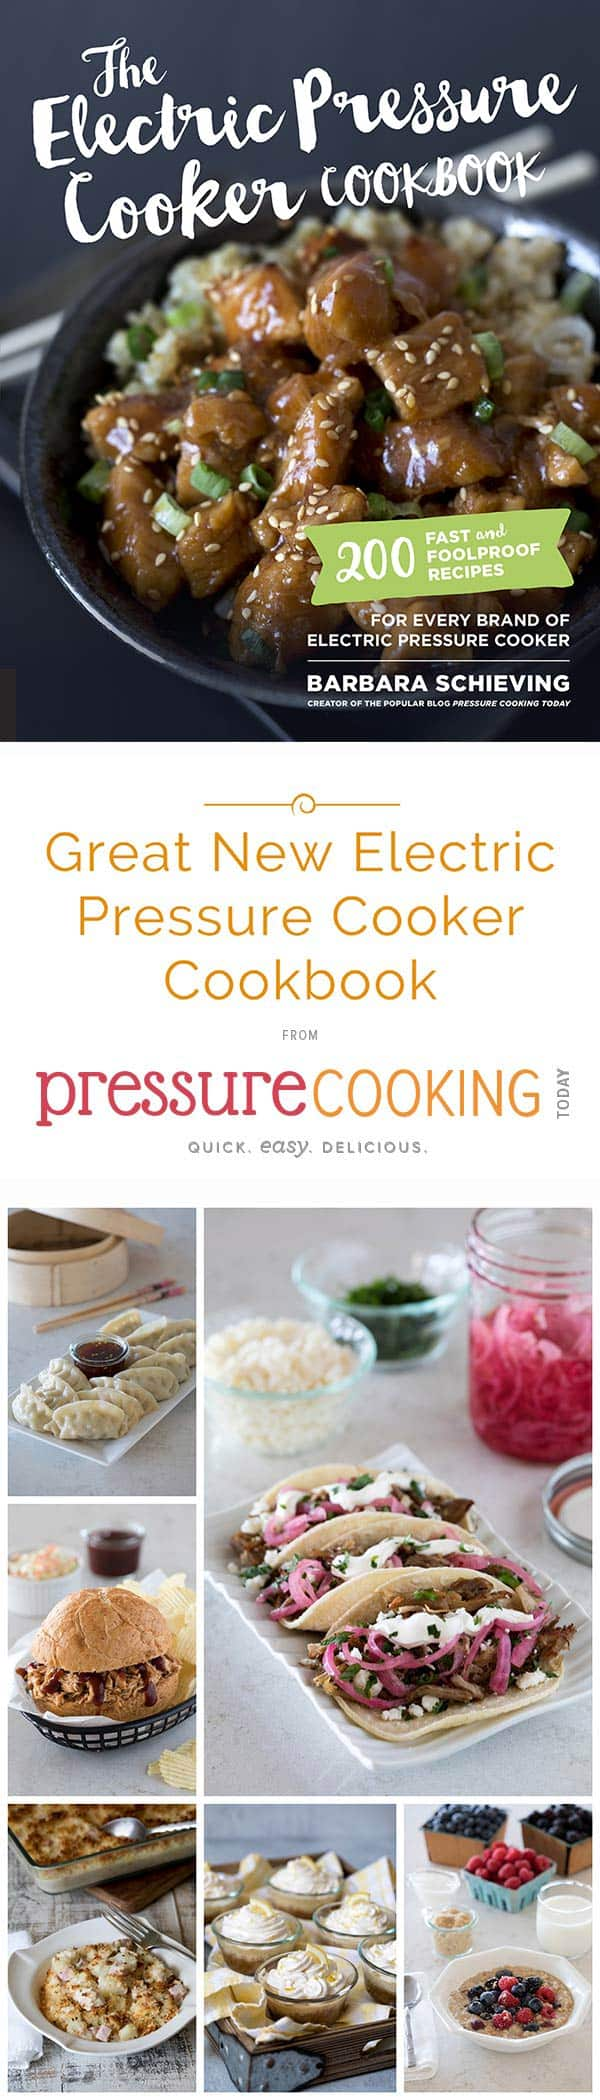 If you love the recipes and pressure cooking advice on Pressure Cooking Today, you're going to love the cookbook. via @PressureCook2da